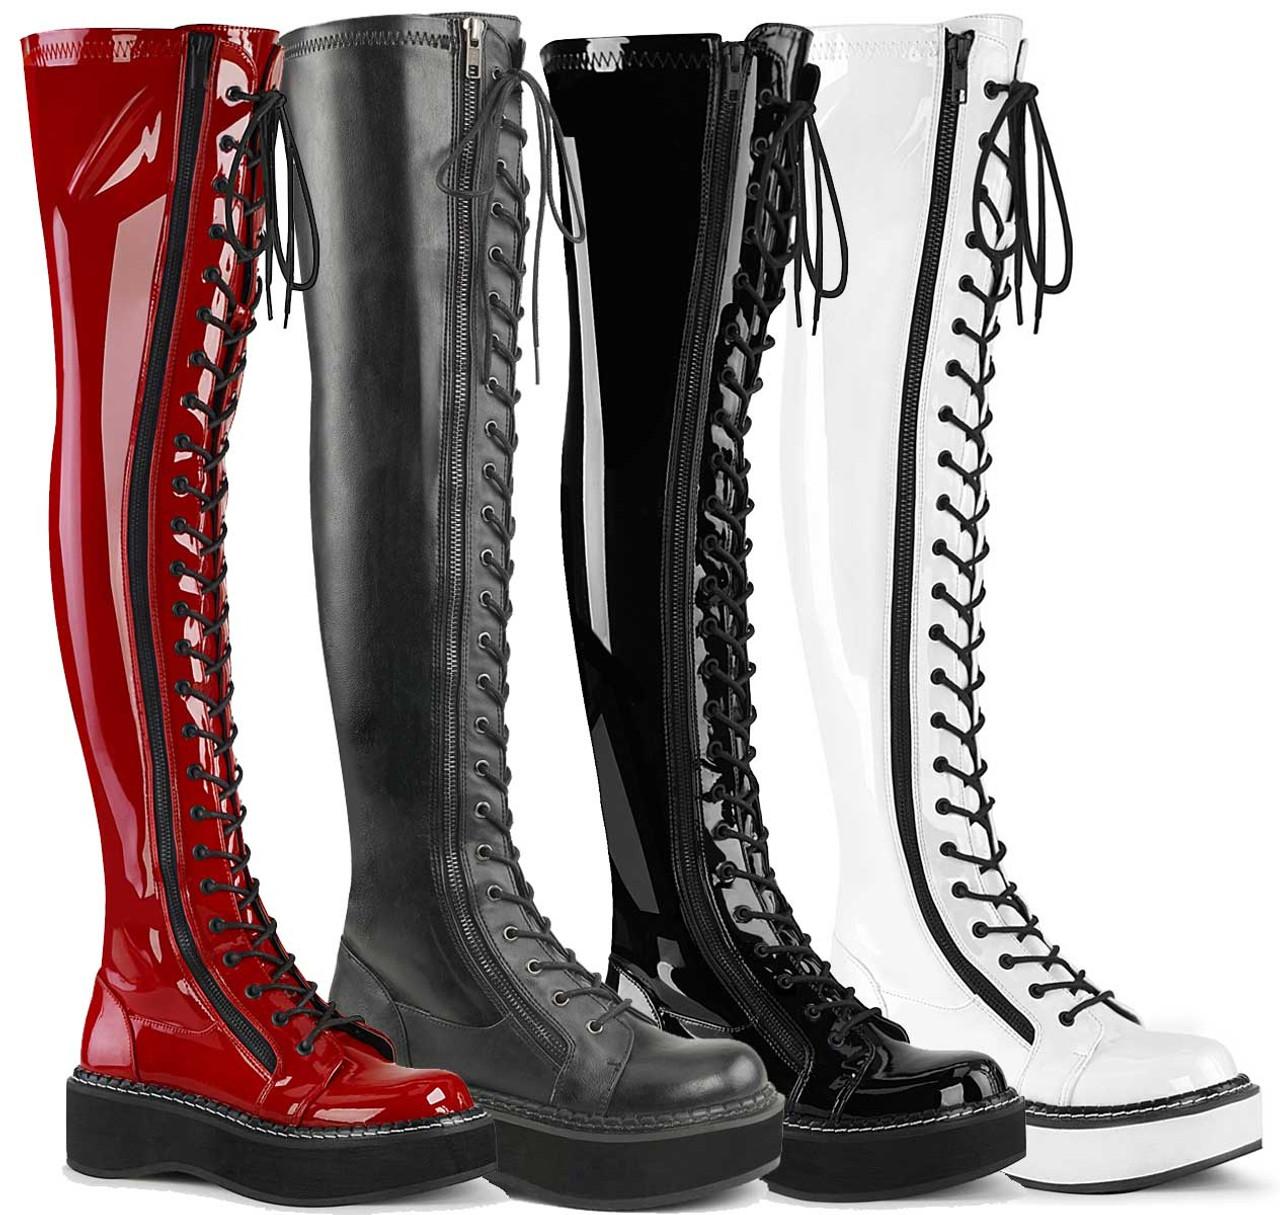 Demonia Emily-375 Platform Boots Womens Black Vegan Leather Thigh High Punk Goth